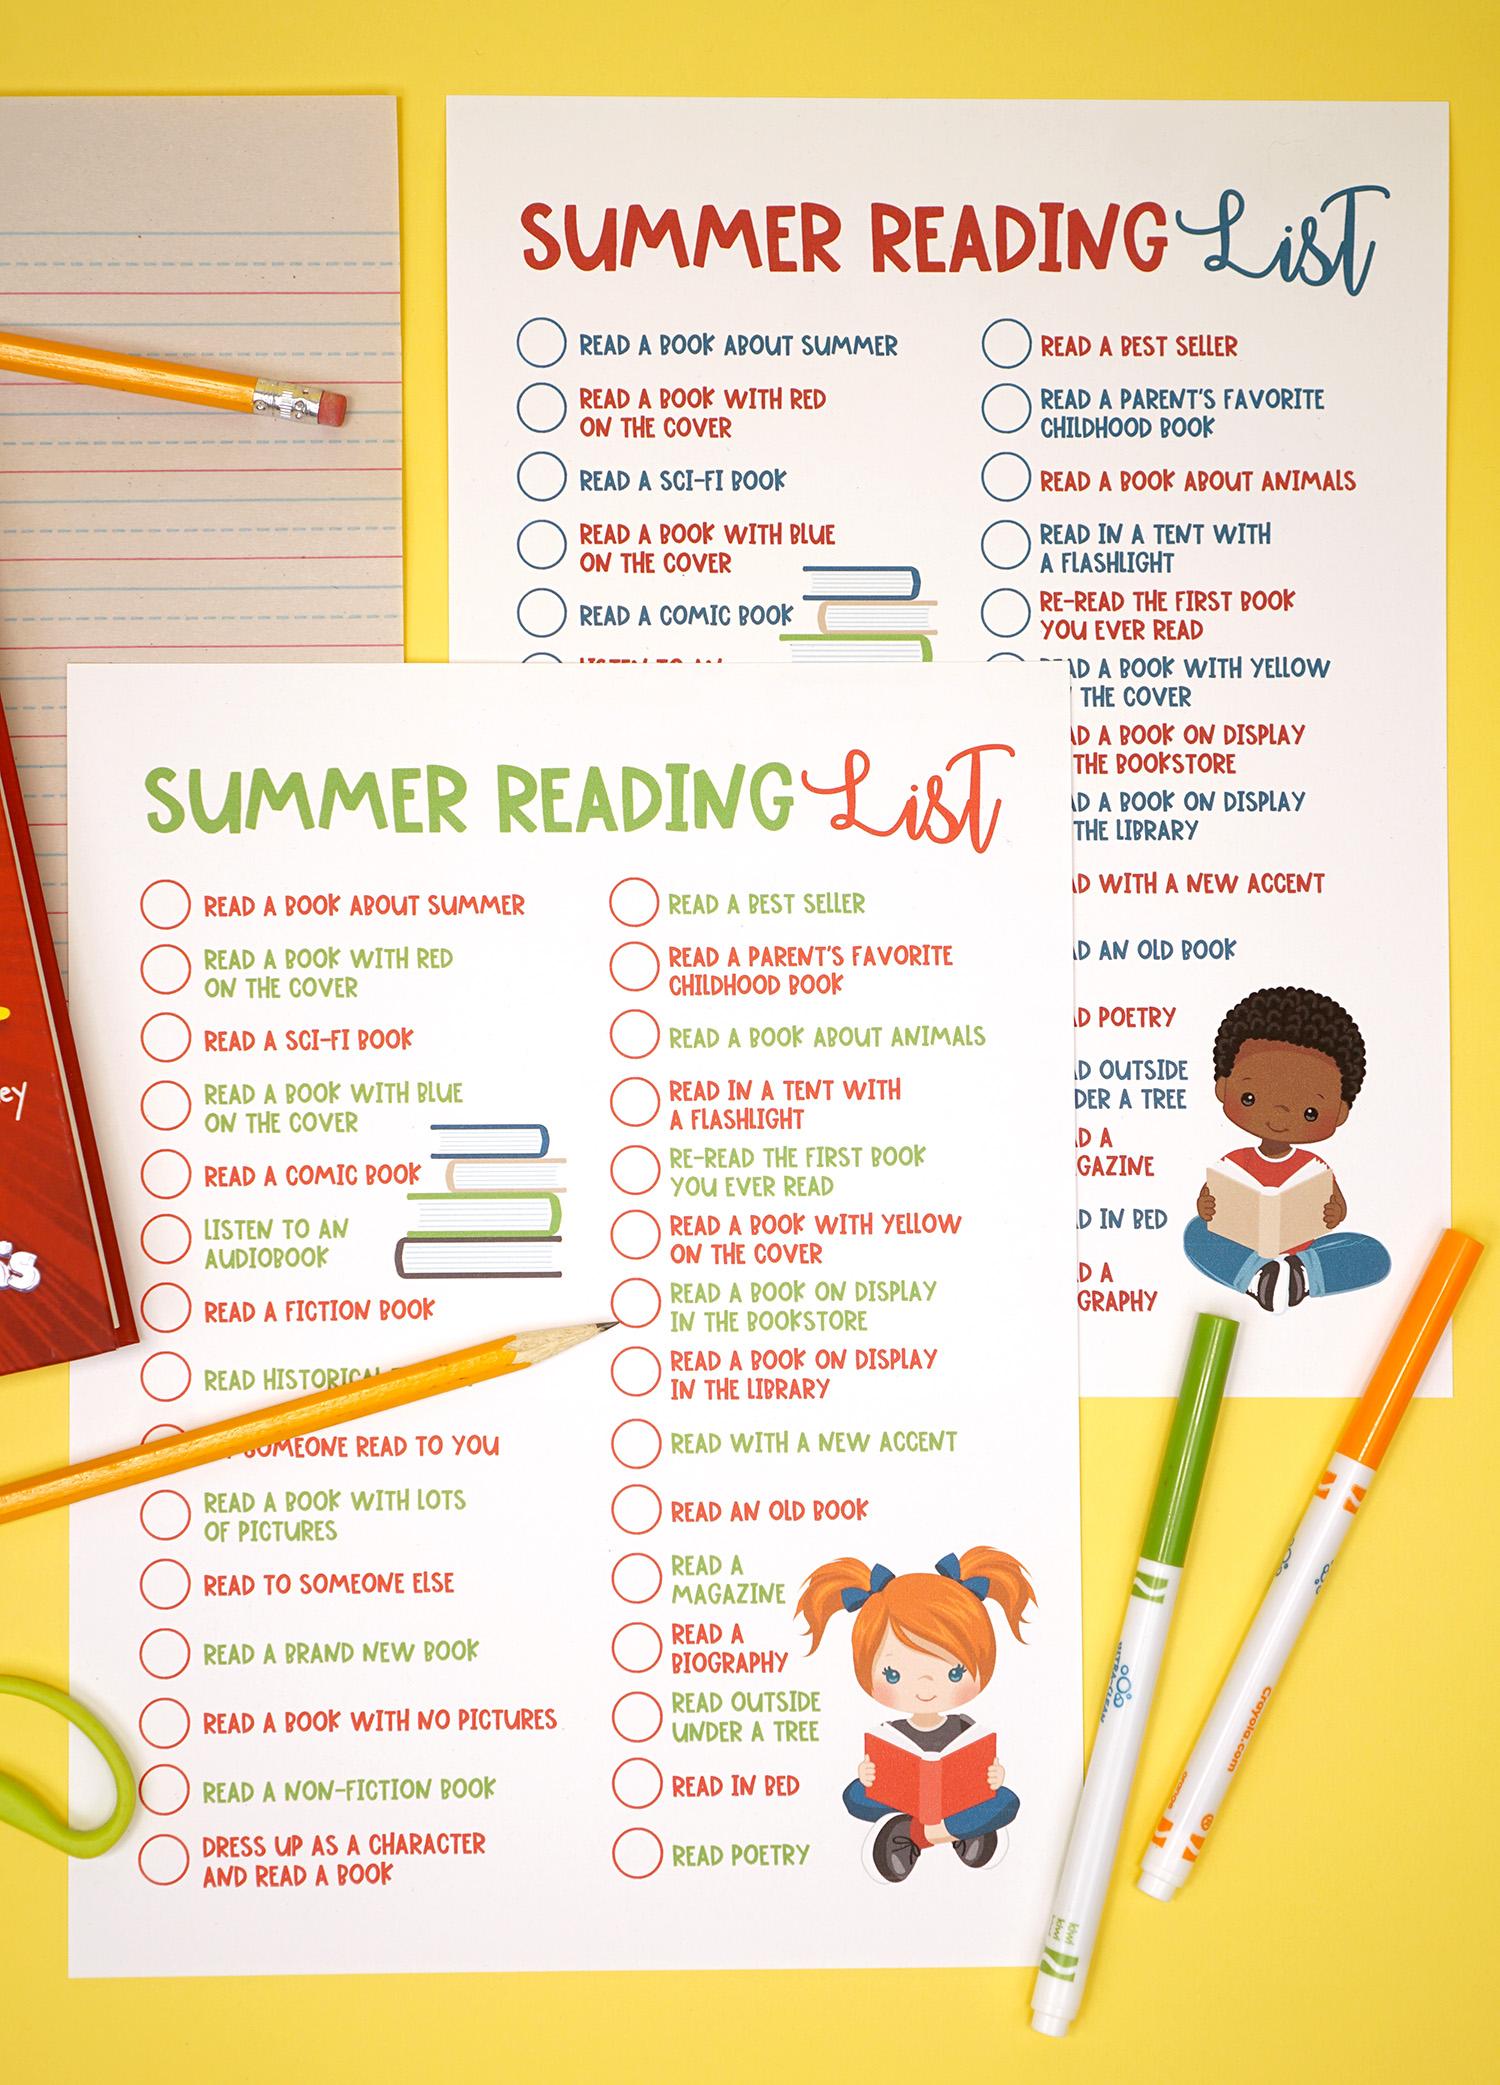 photograph regarding Who Was Book Series Printable List called Printable Summertime Examining Dilemma Checklist for Children - Pleasure